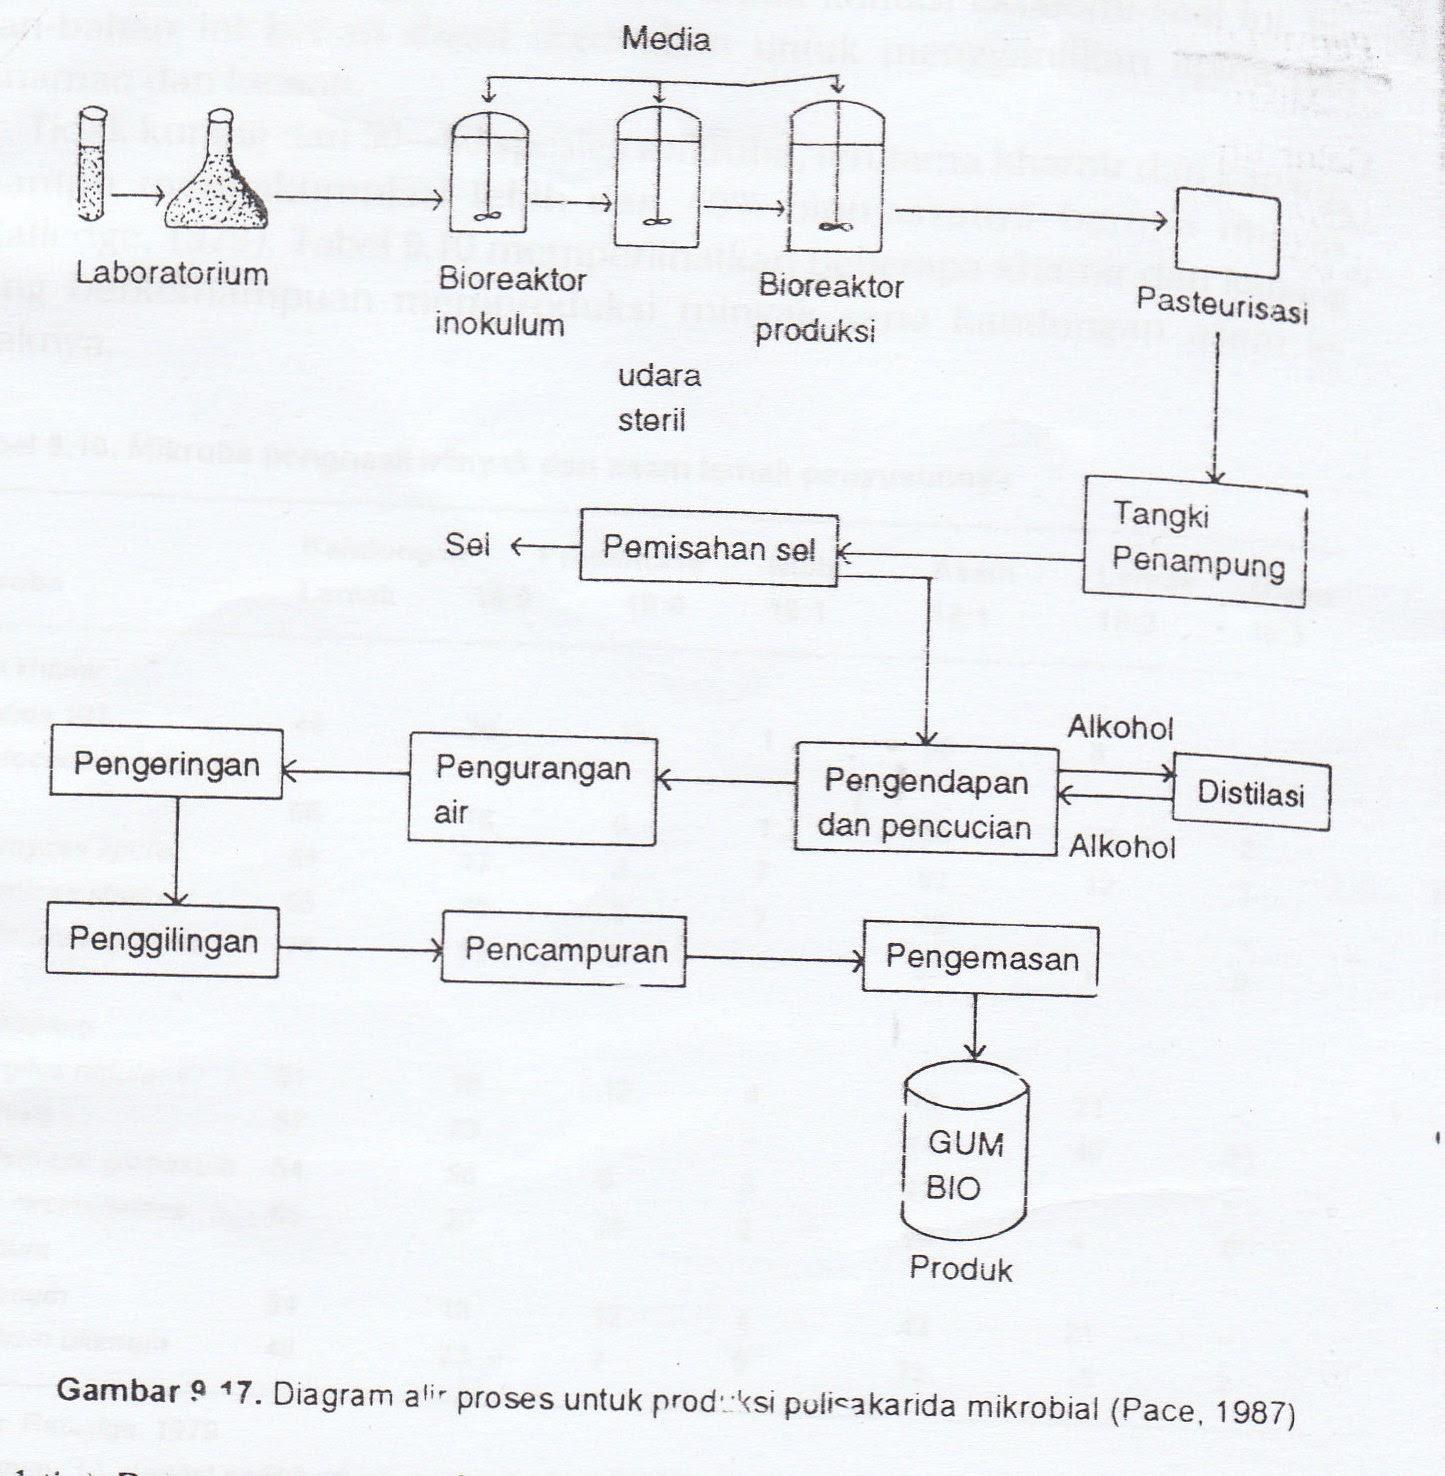 diagram for 5 gum digital thermostat wiring college note produk hasil fermentasi